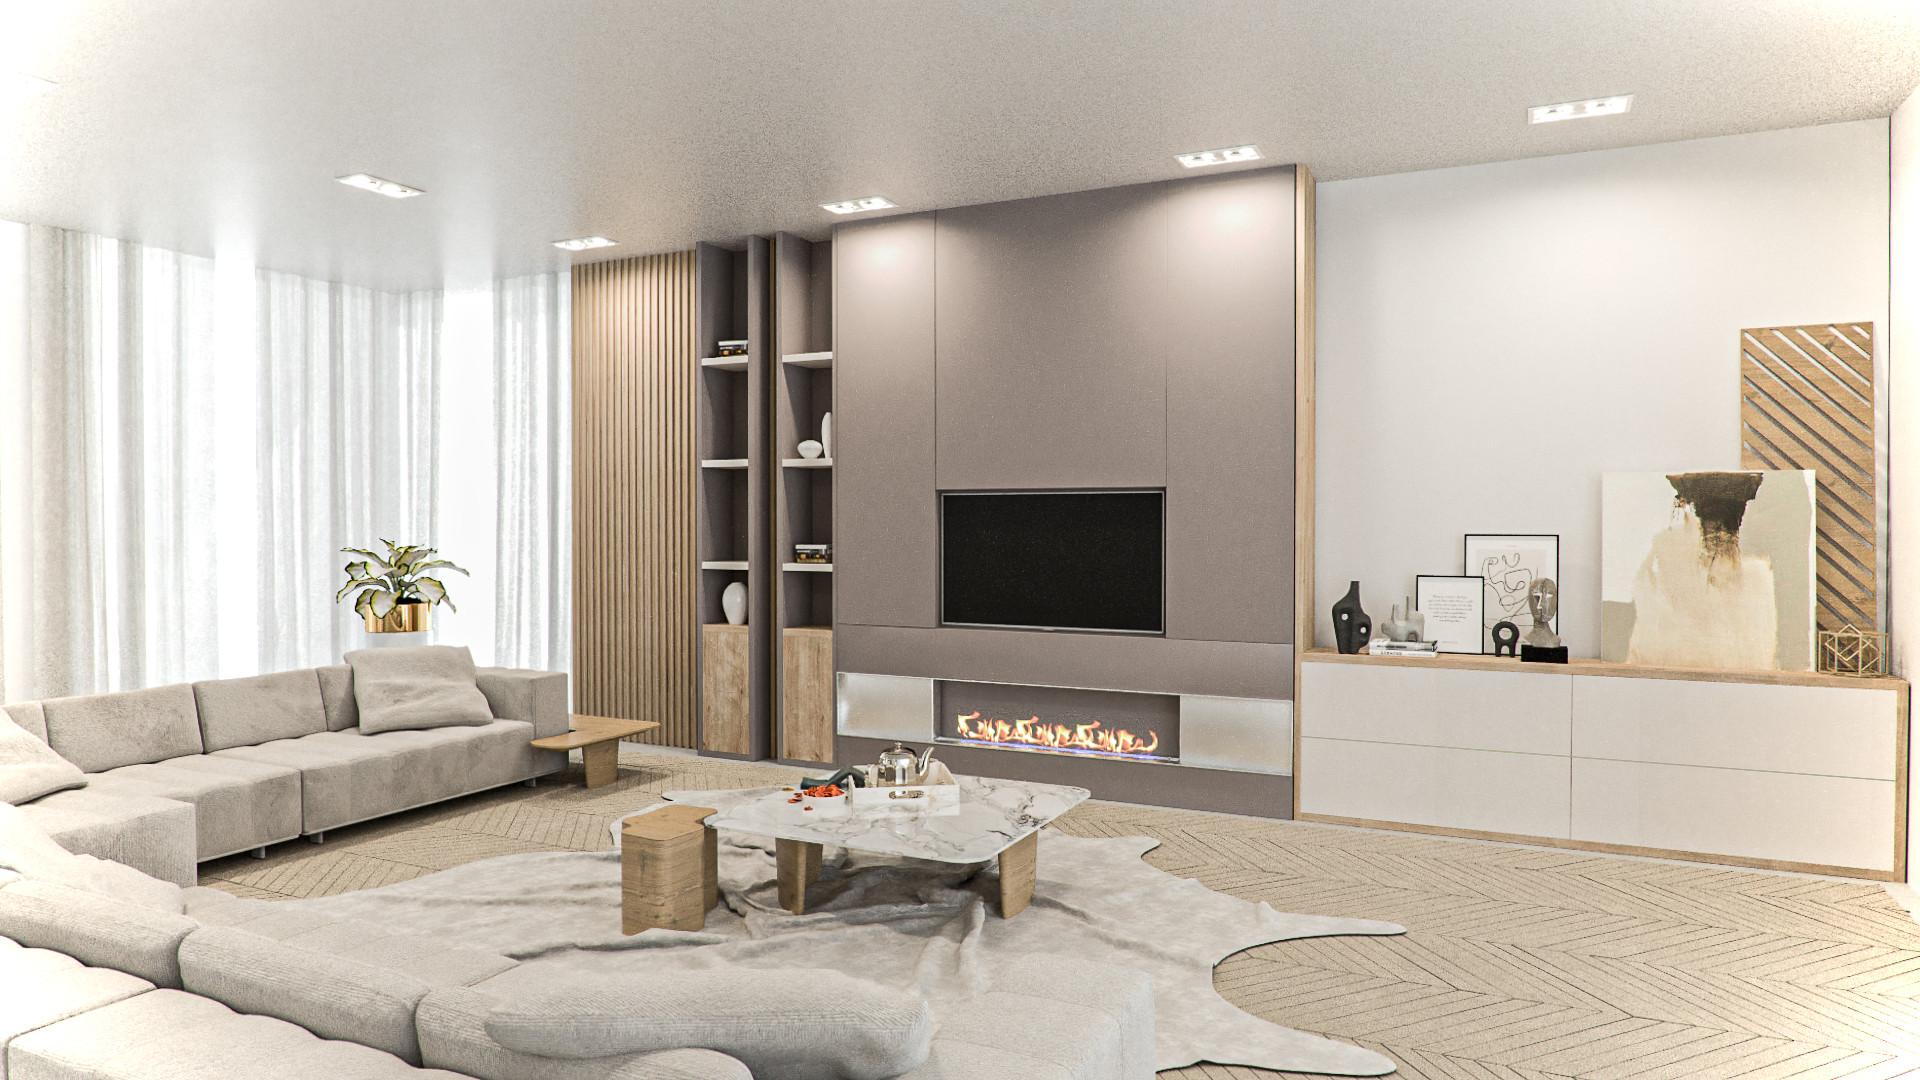 sala íntima cor neutra minimalista origens 2022